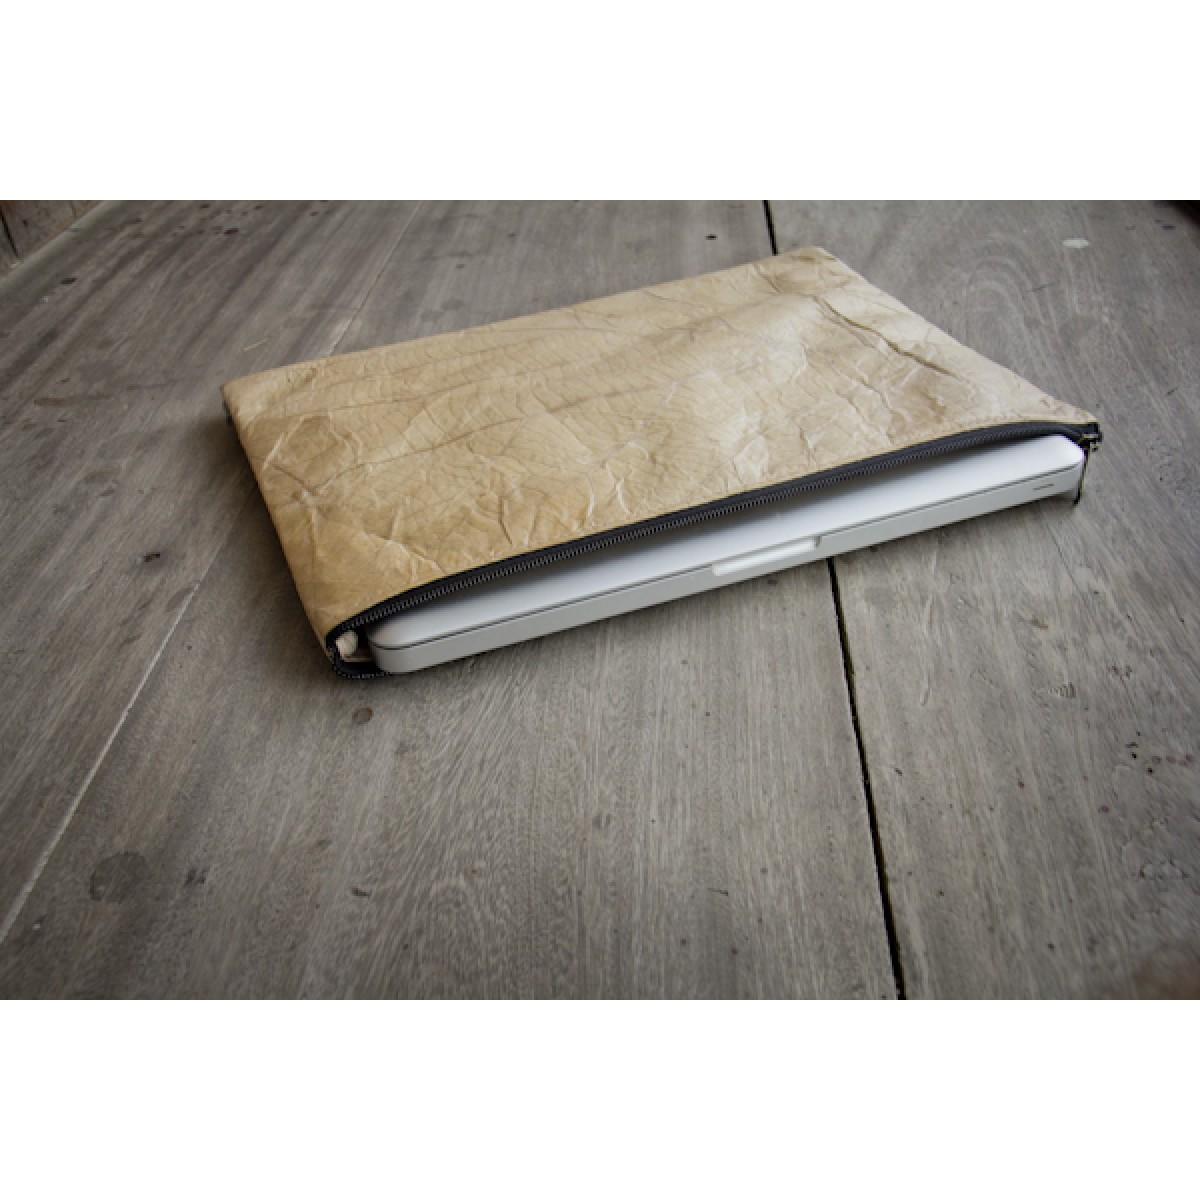 Laptop Hülle aus Blättern, Notebook Tasche, MacBook Case in hellbraun, 15 Zoll BY COPALA